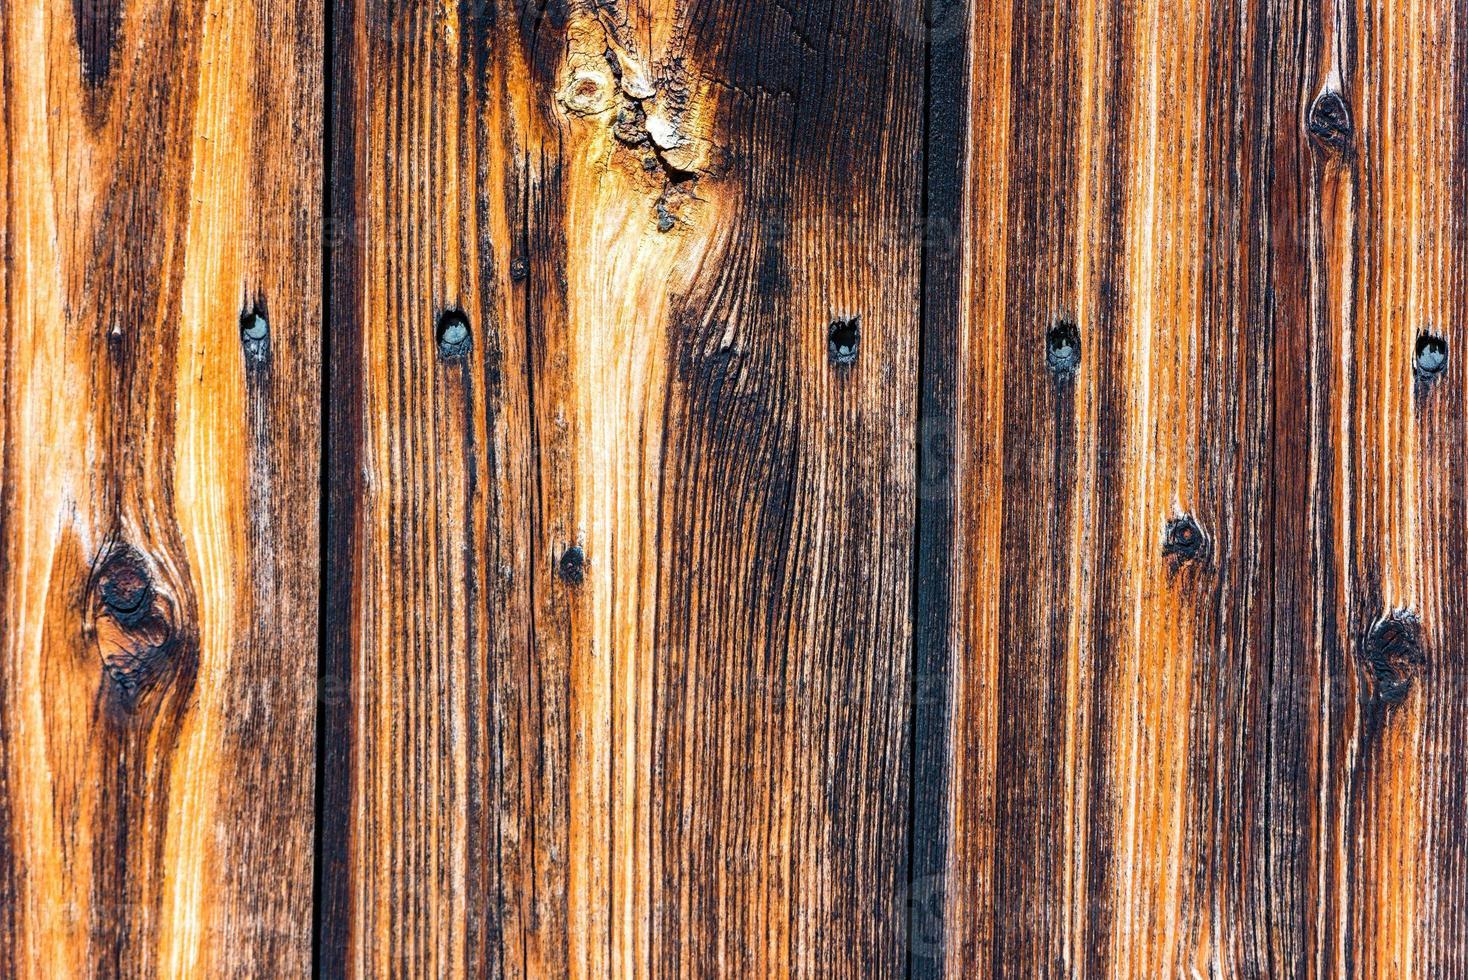 gamla träplankor yta bakgrund foto